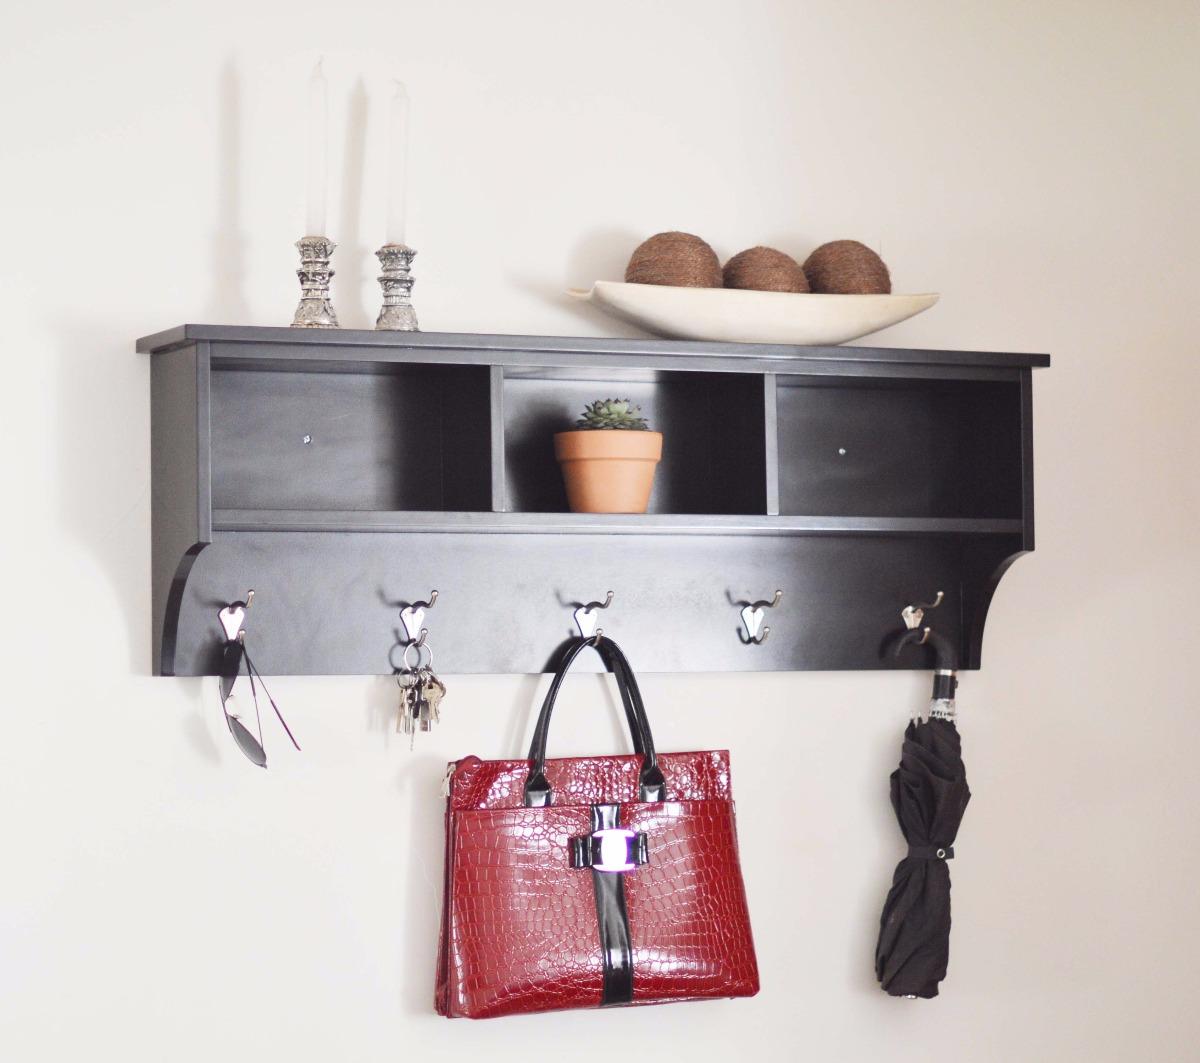 Mueble Repisa Perchero Moderno, Decoracion Sala Comedor - $ 1,899.00 ...